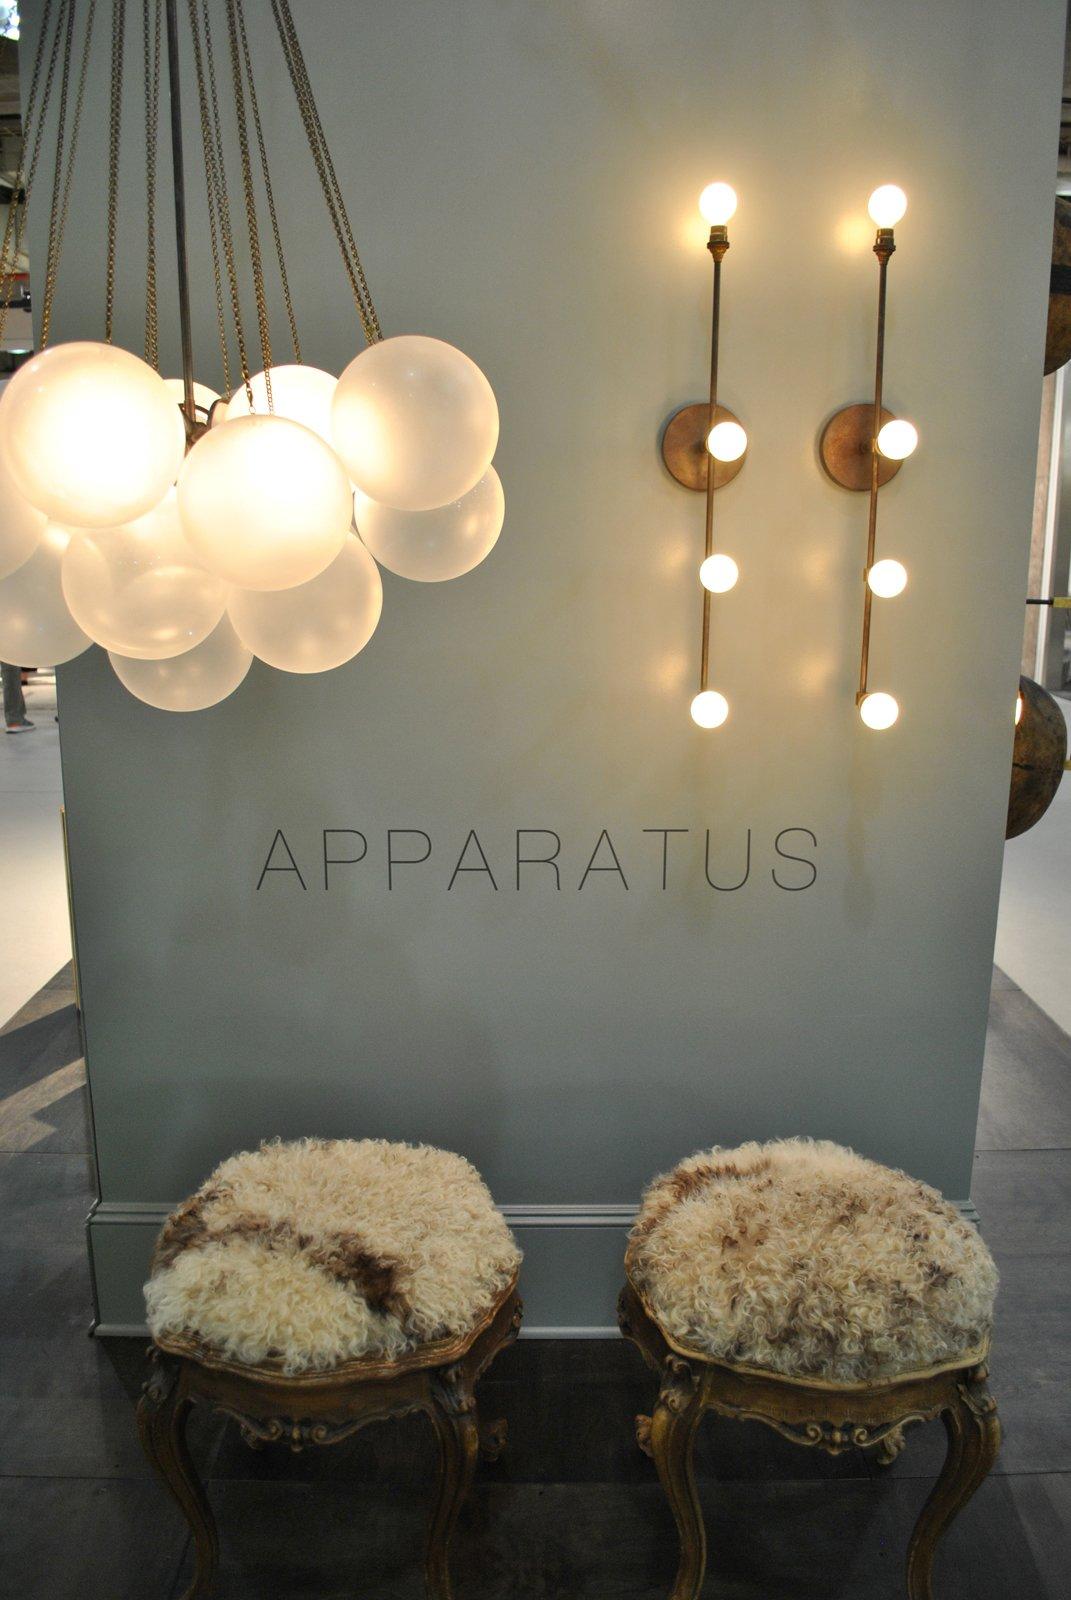 "Lighting by New York's Apparatus Studio.  Search ""완도출장마사지-출장안마-출장-출장서비스 완도콜걸 출장샵 { ㅋr톡bc288 }  주소{ ☻sannhu,com }  완도 출장여대생 만남 출장만남 업소 타이마사지 출장샵추천 업소  완도출장샵 출장서비스 출장업소"" from ICFF 2012: Brass Tactics"